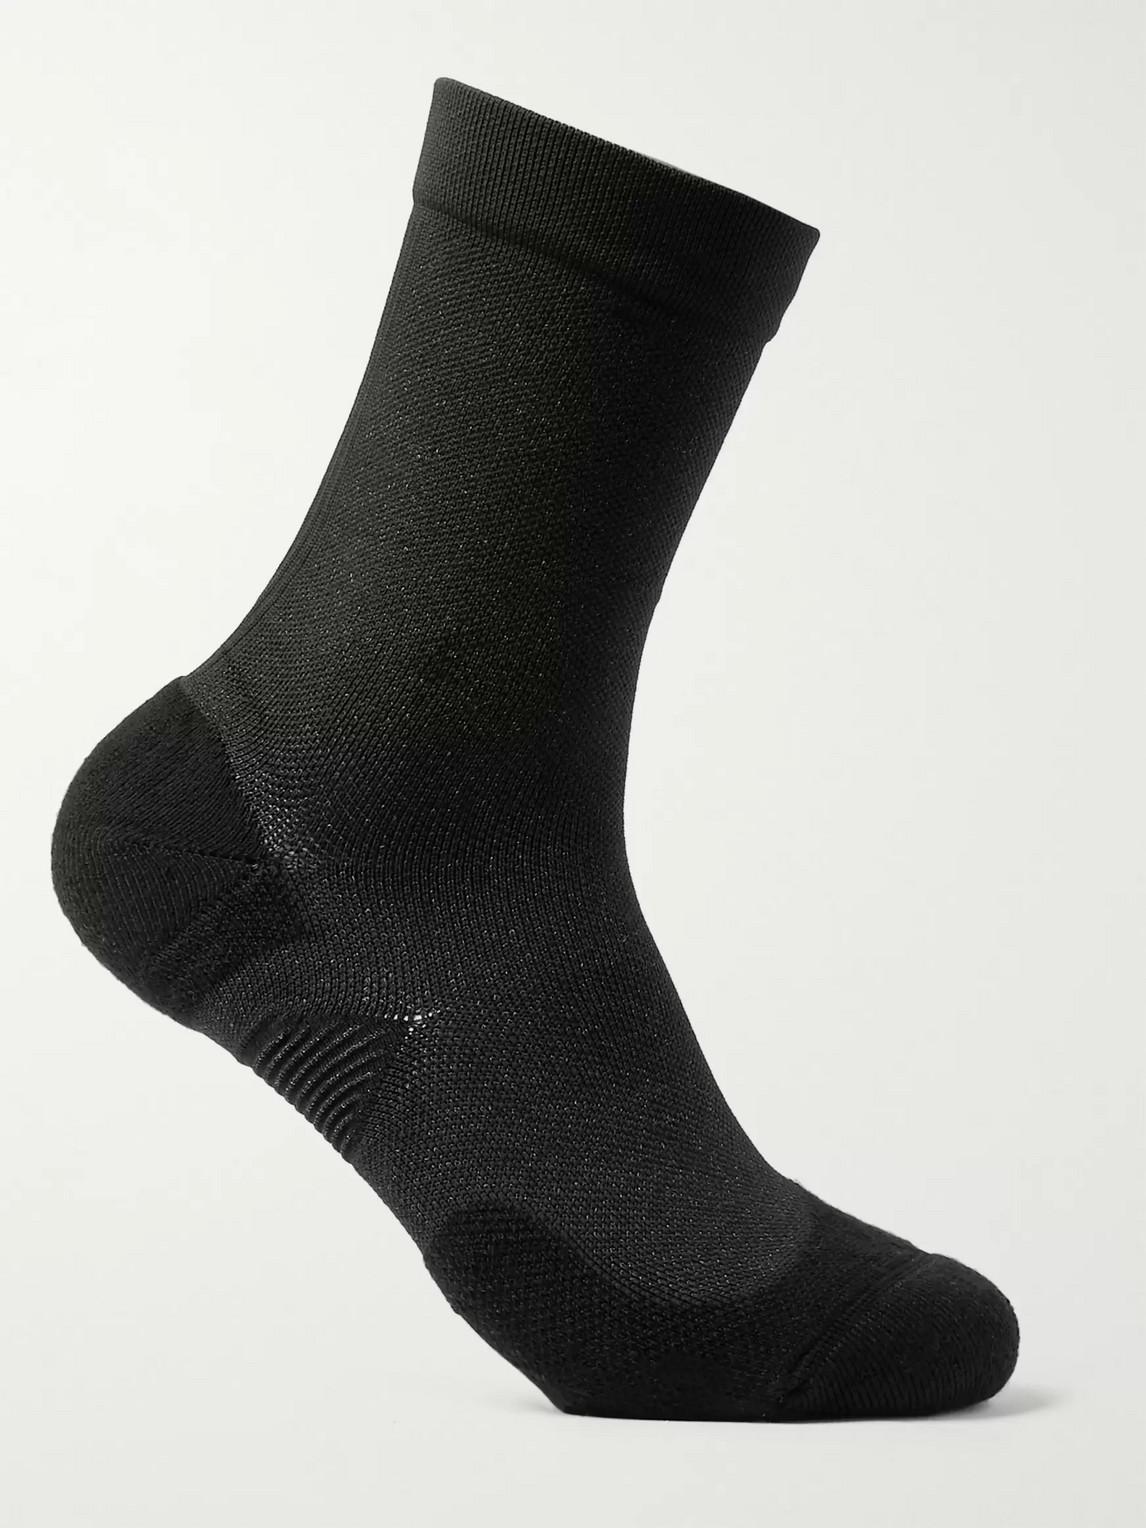 lululemon - t.h.e. crew stretch-knit socks - men - black